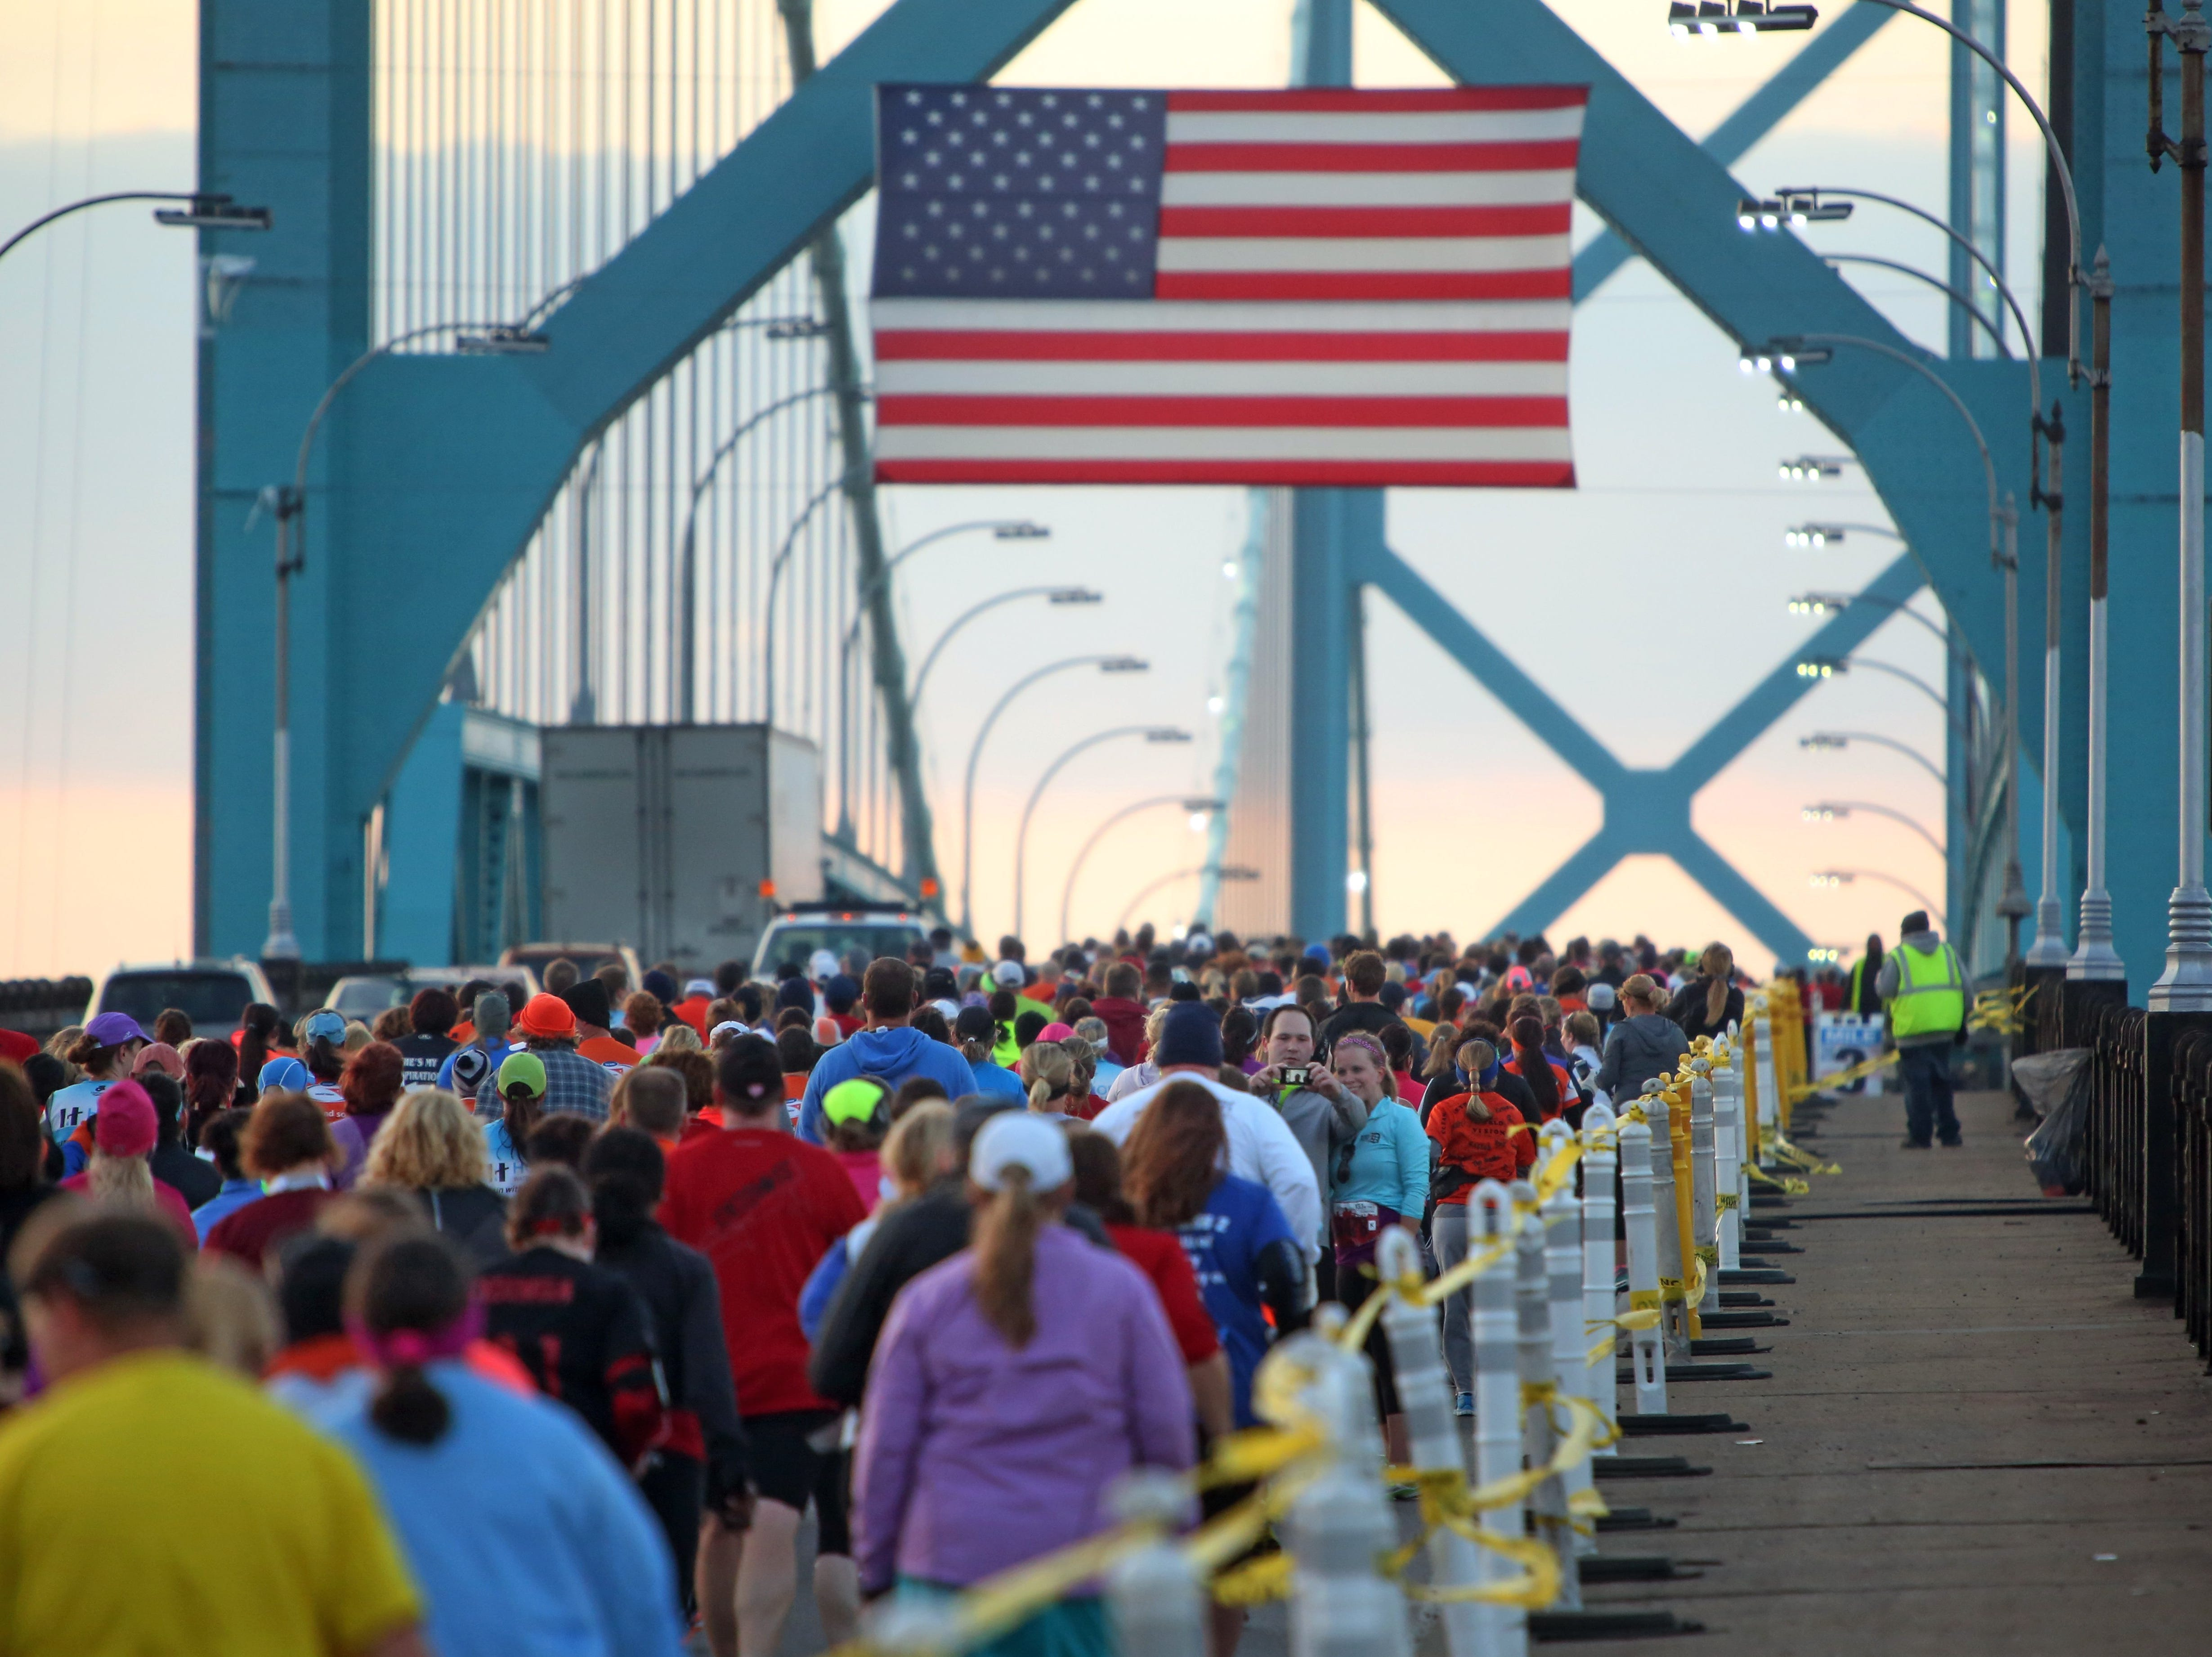 Runners run across the Ambassador Bridge during the 36th Annual Detroit Free Press / Talmer Bank Marathon in Detroit on Sunday, Oct. 20, 2013.